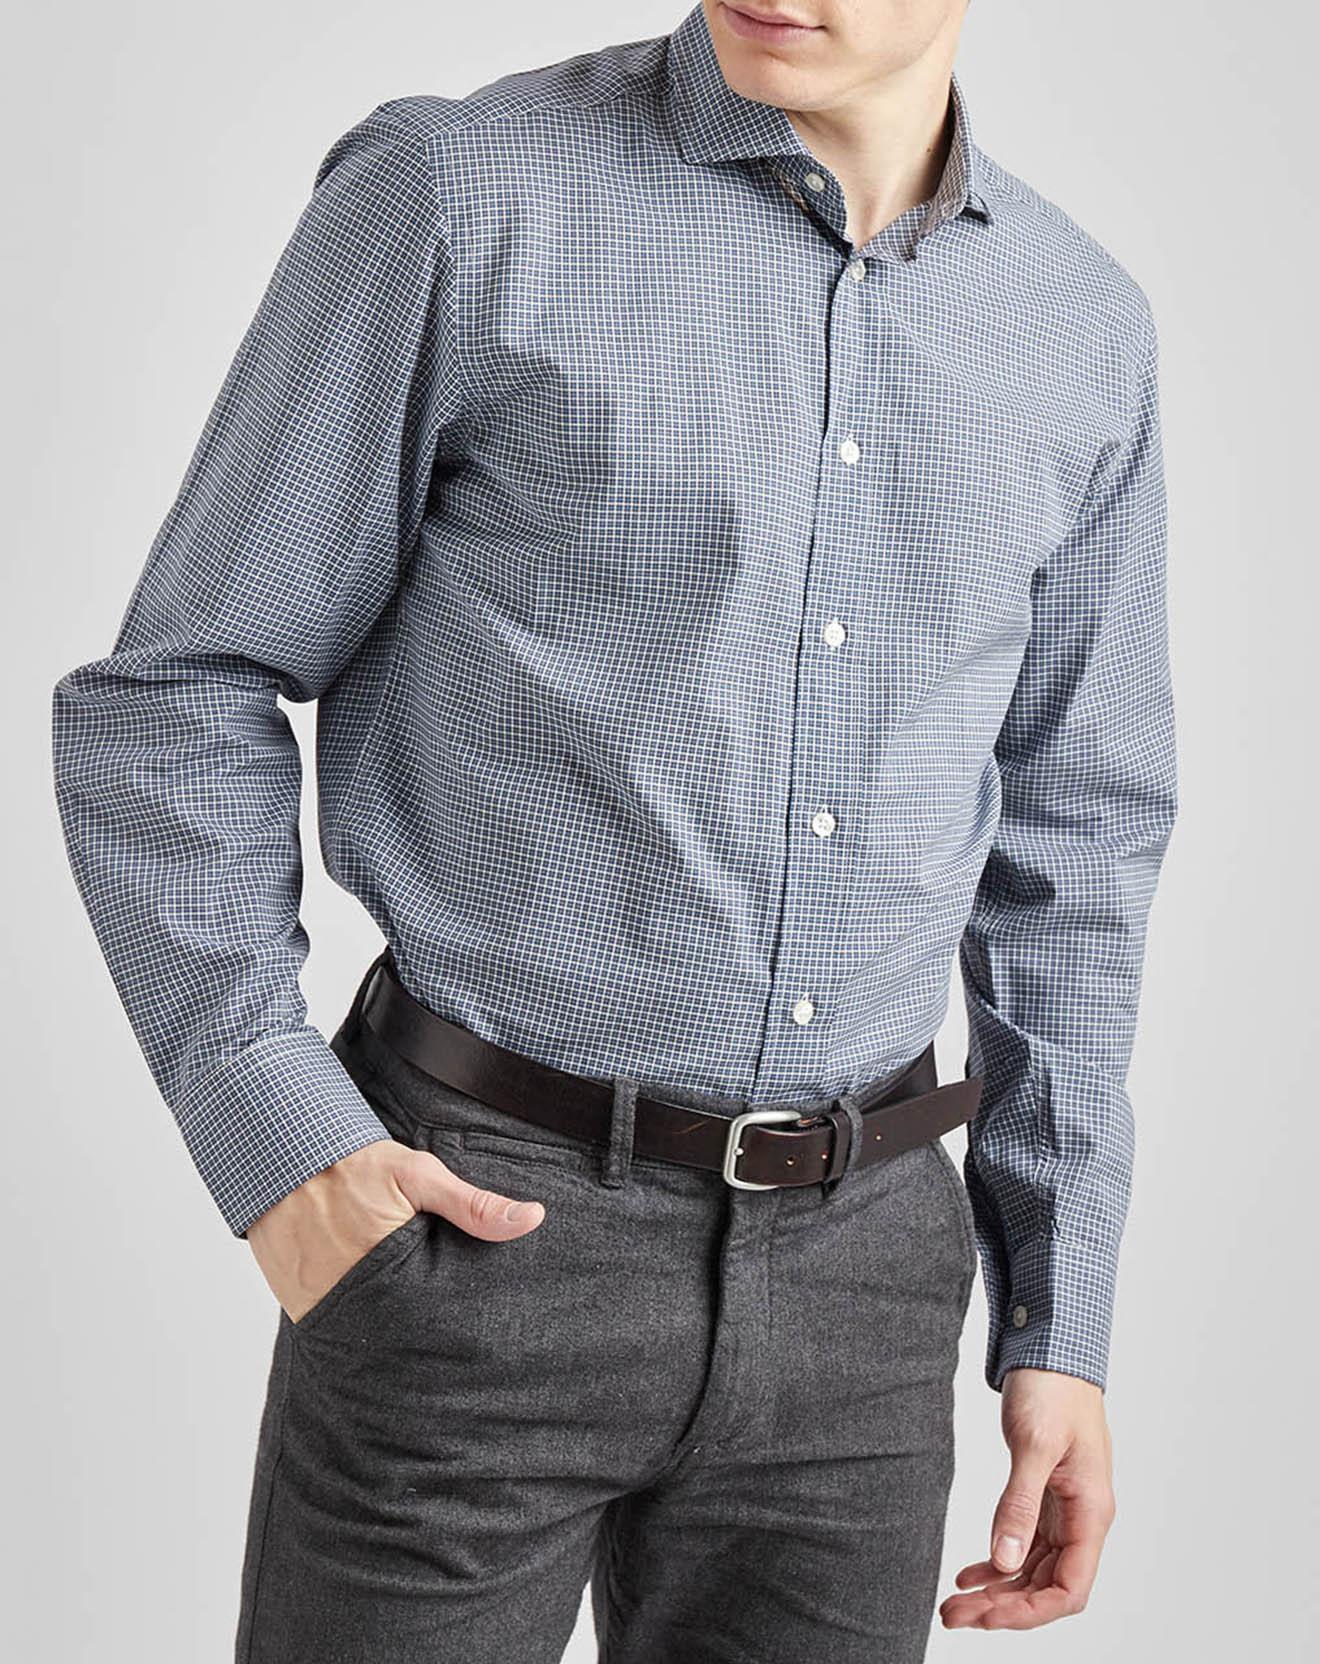 Chemise sportswear carreaux bleue - Façonnable - Modalova